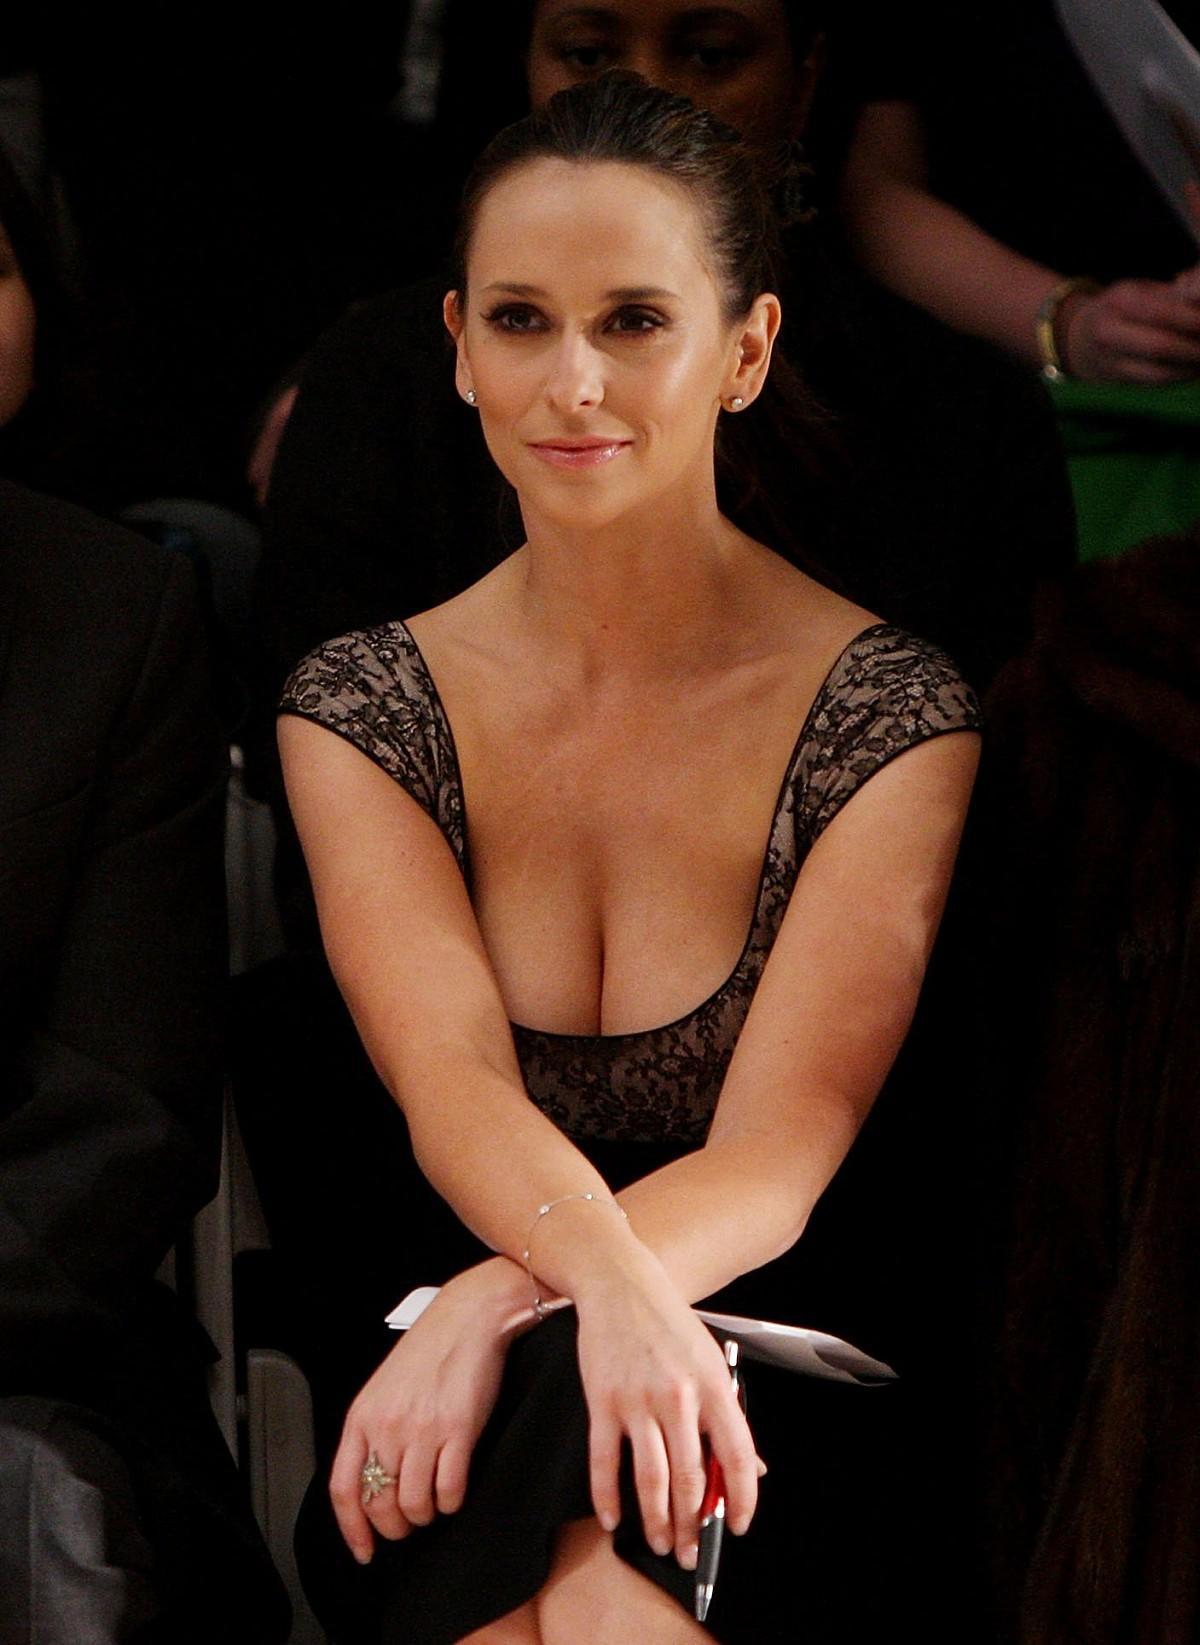 Jennifer Love Hewitt desnuda y en busca de nuevo